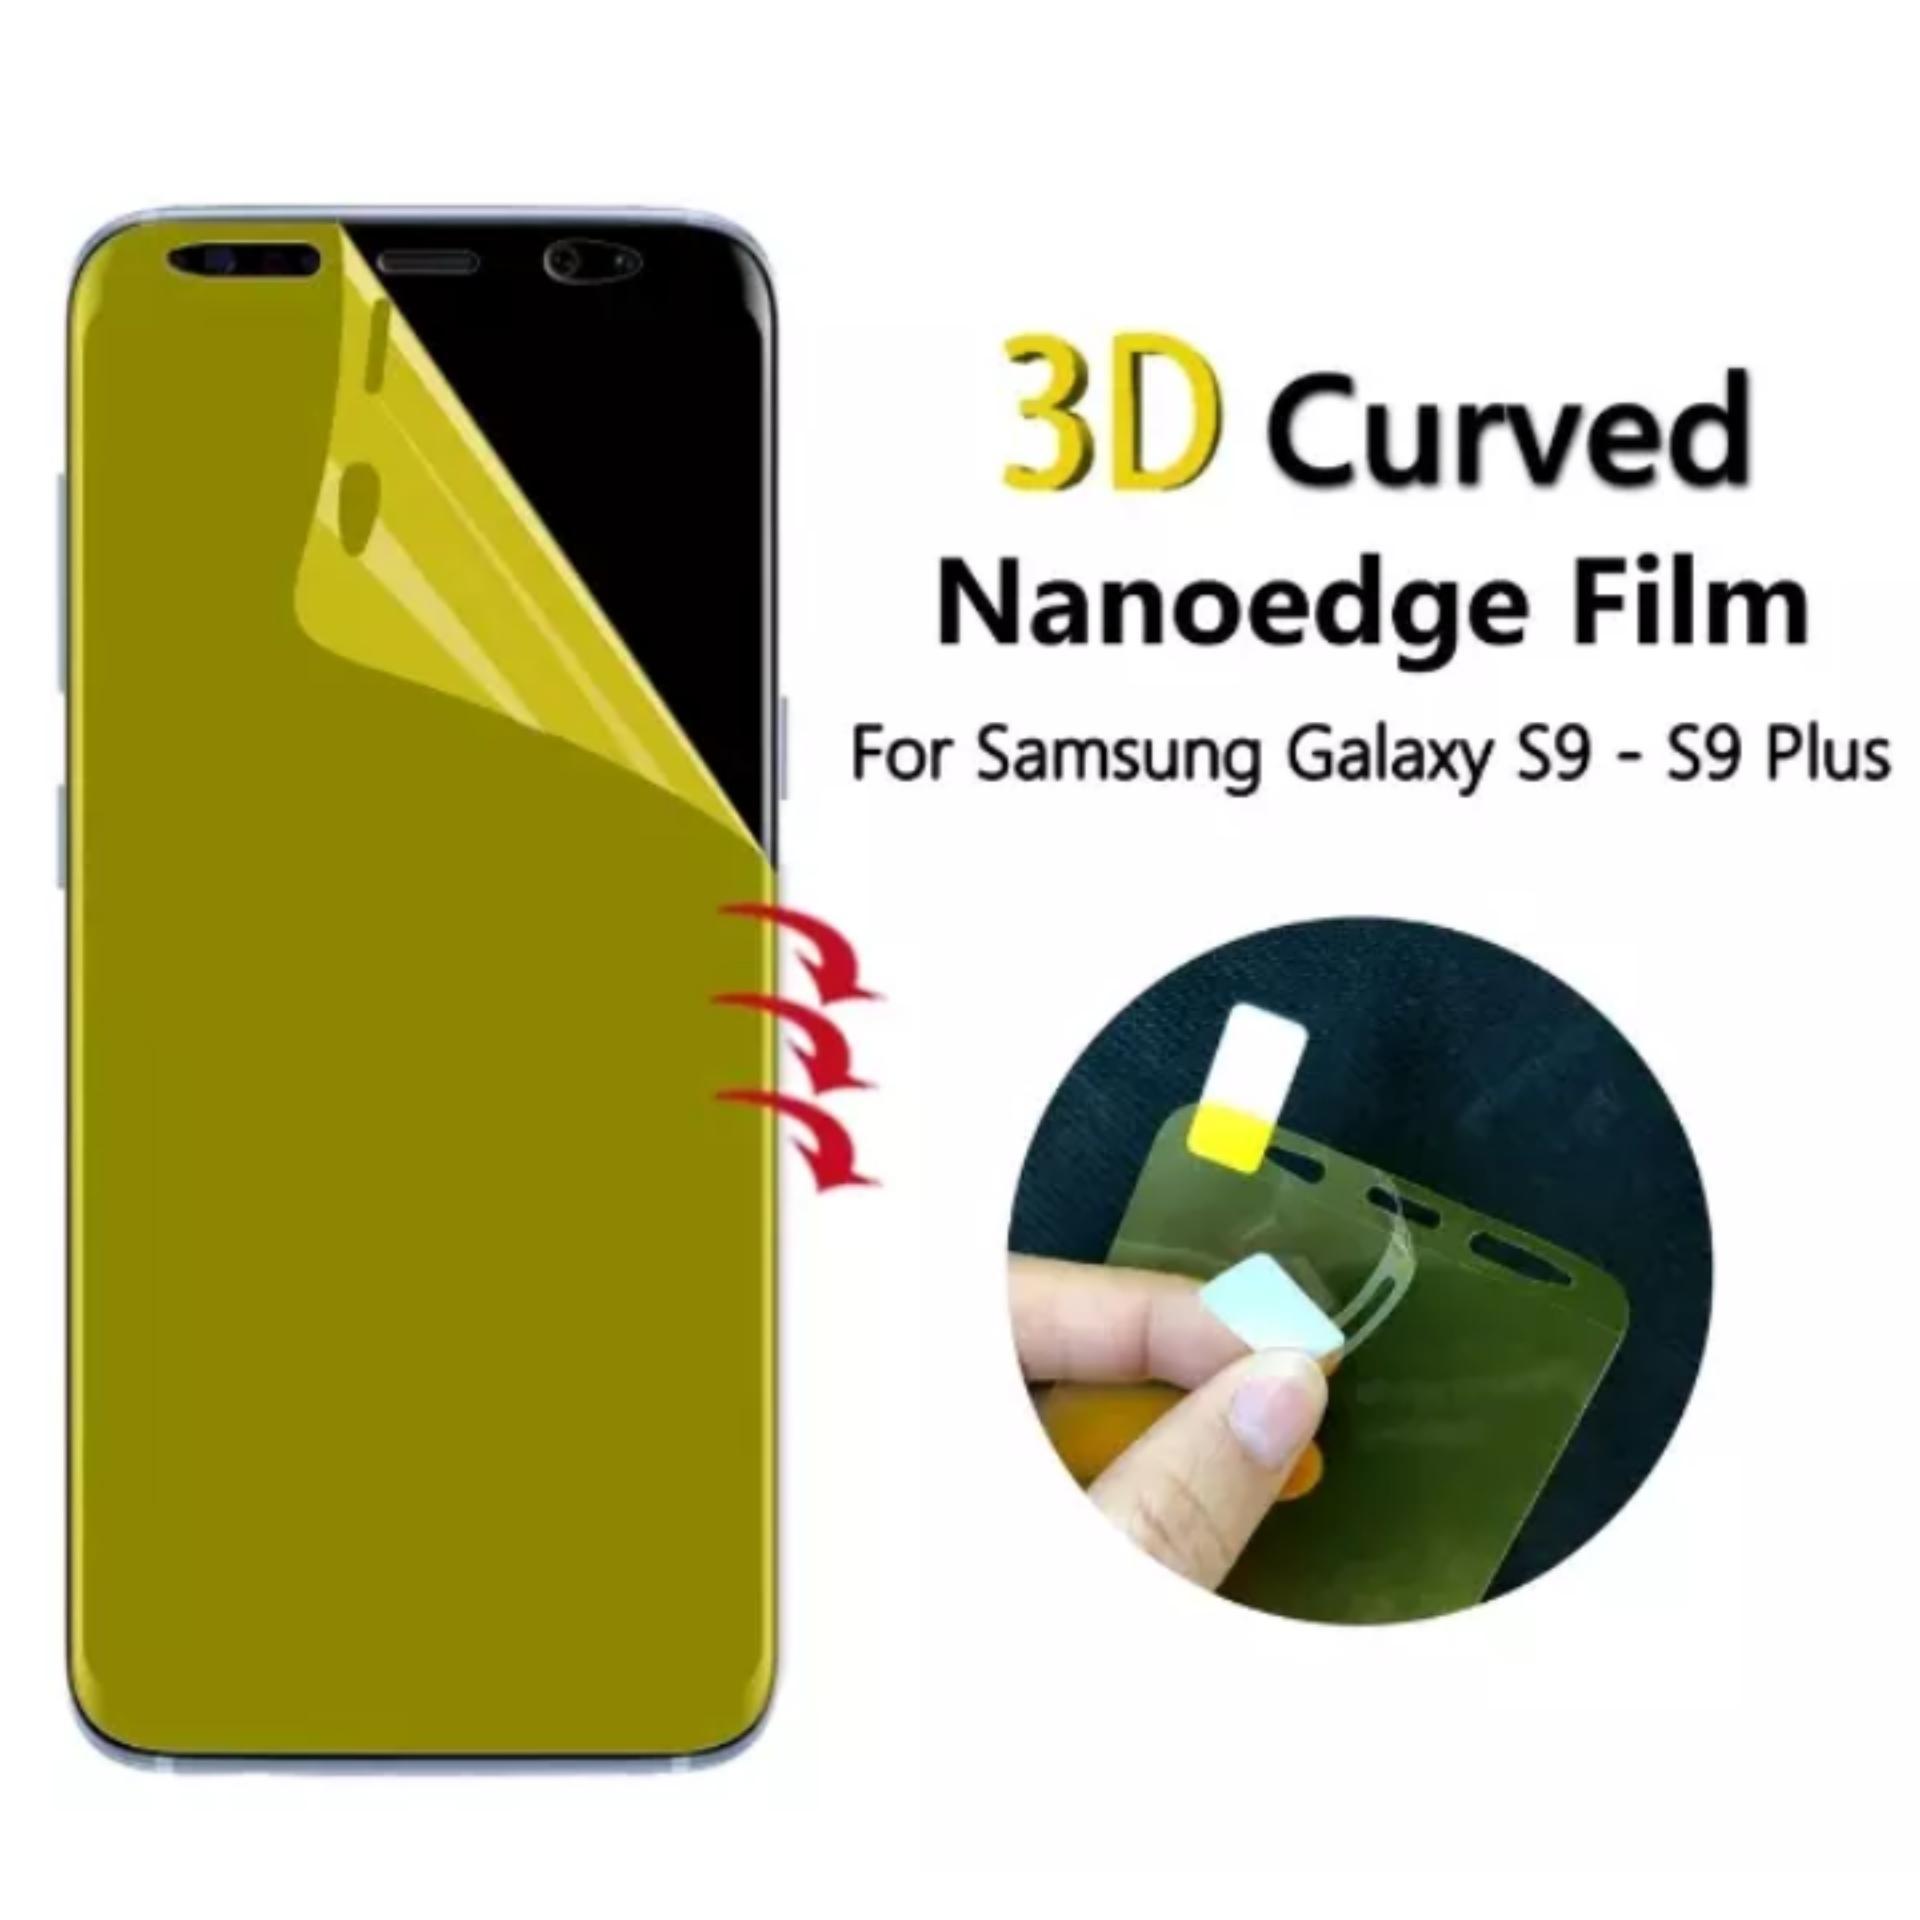 Cek Harga Baru Tpu Edge Samsung Galaxy Note 5 N920 Duos Lte Anti Gores Shock Screen Protector S7 Full Depanbelakang 3d For S9 Plus Jelly